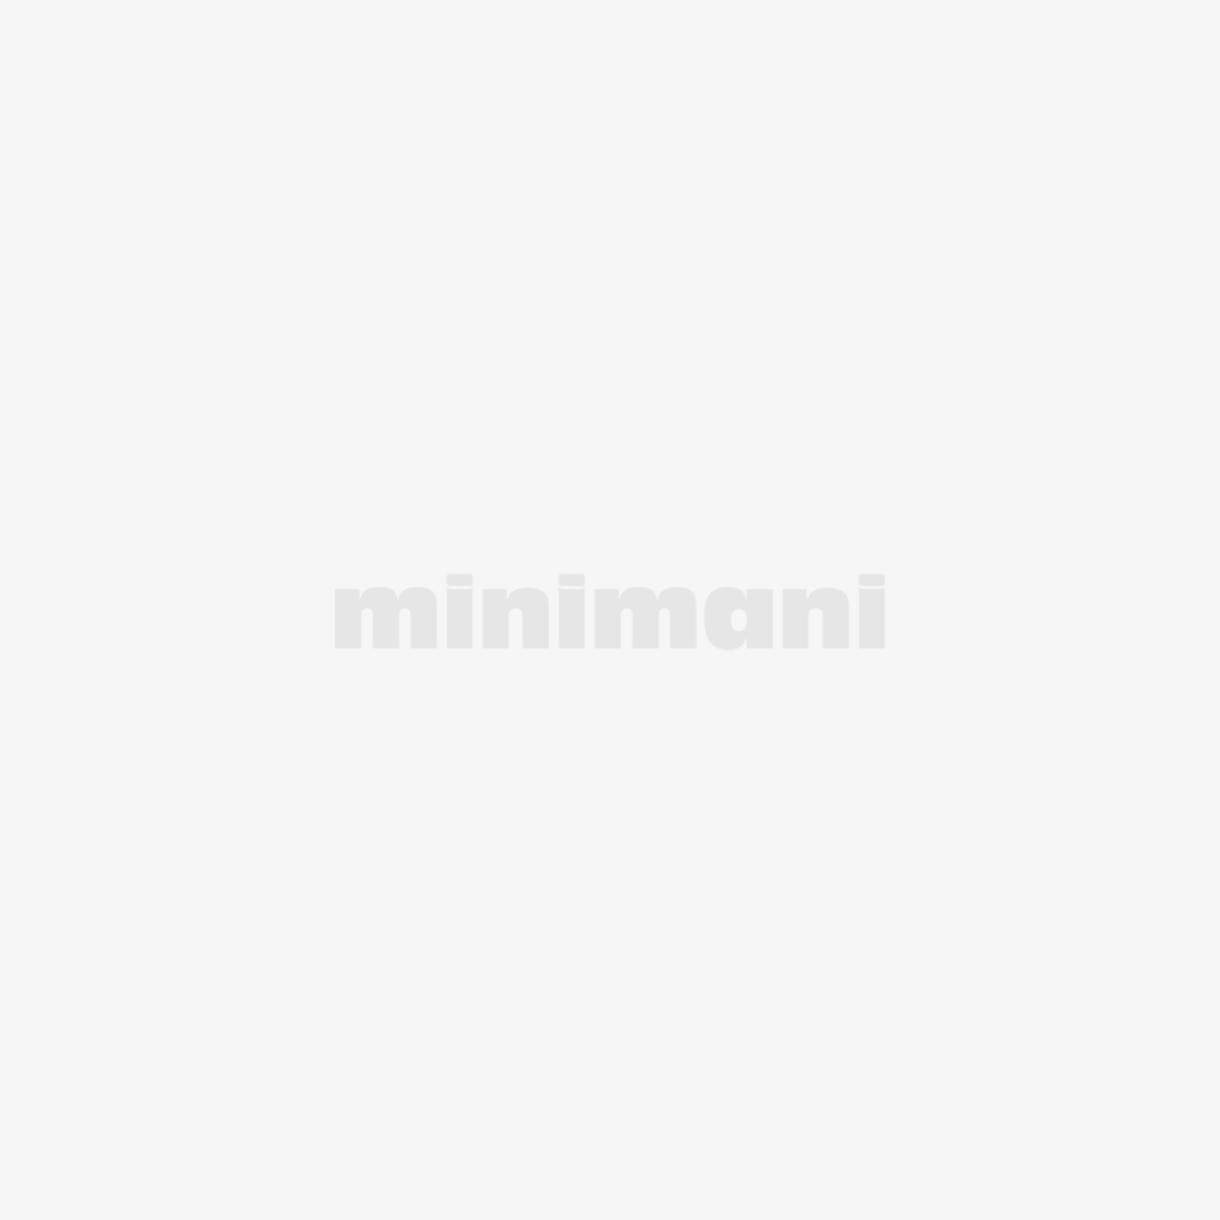 FINLAYSON PL+TL NIITTY VIININPUNAINEN/BEIGE 150X210+50x60